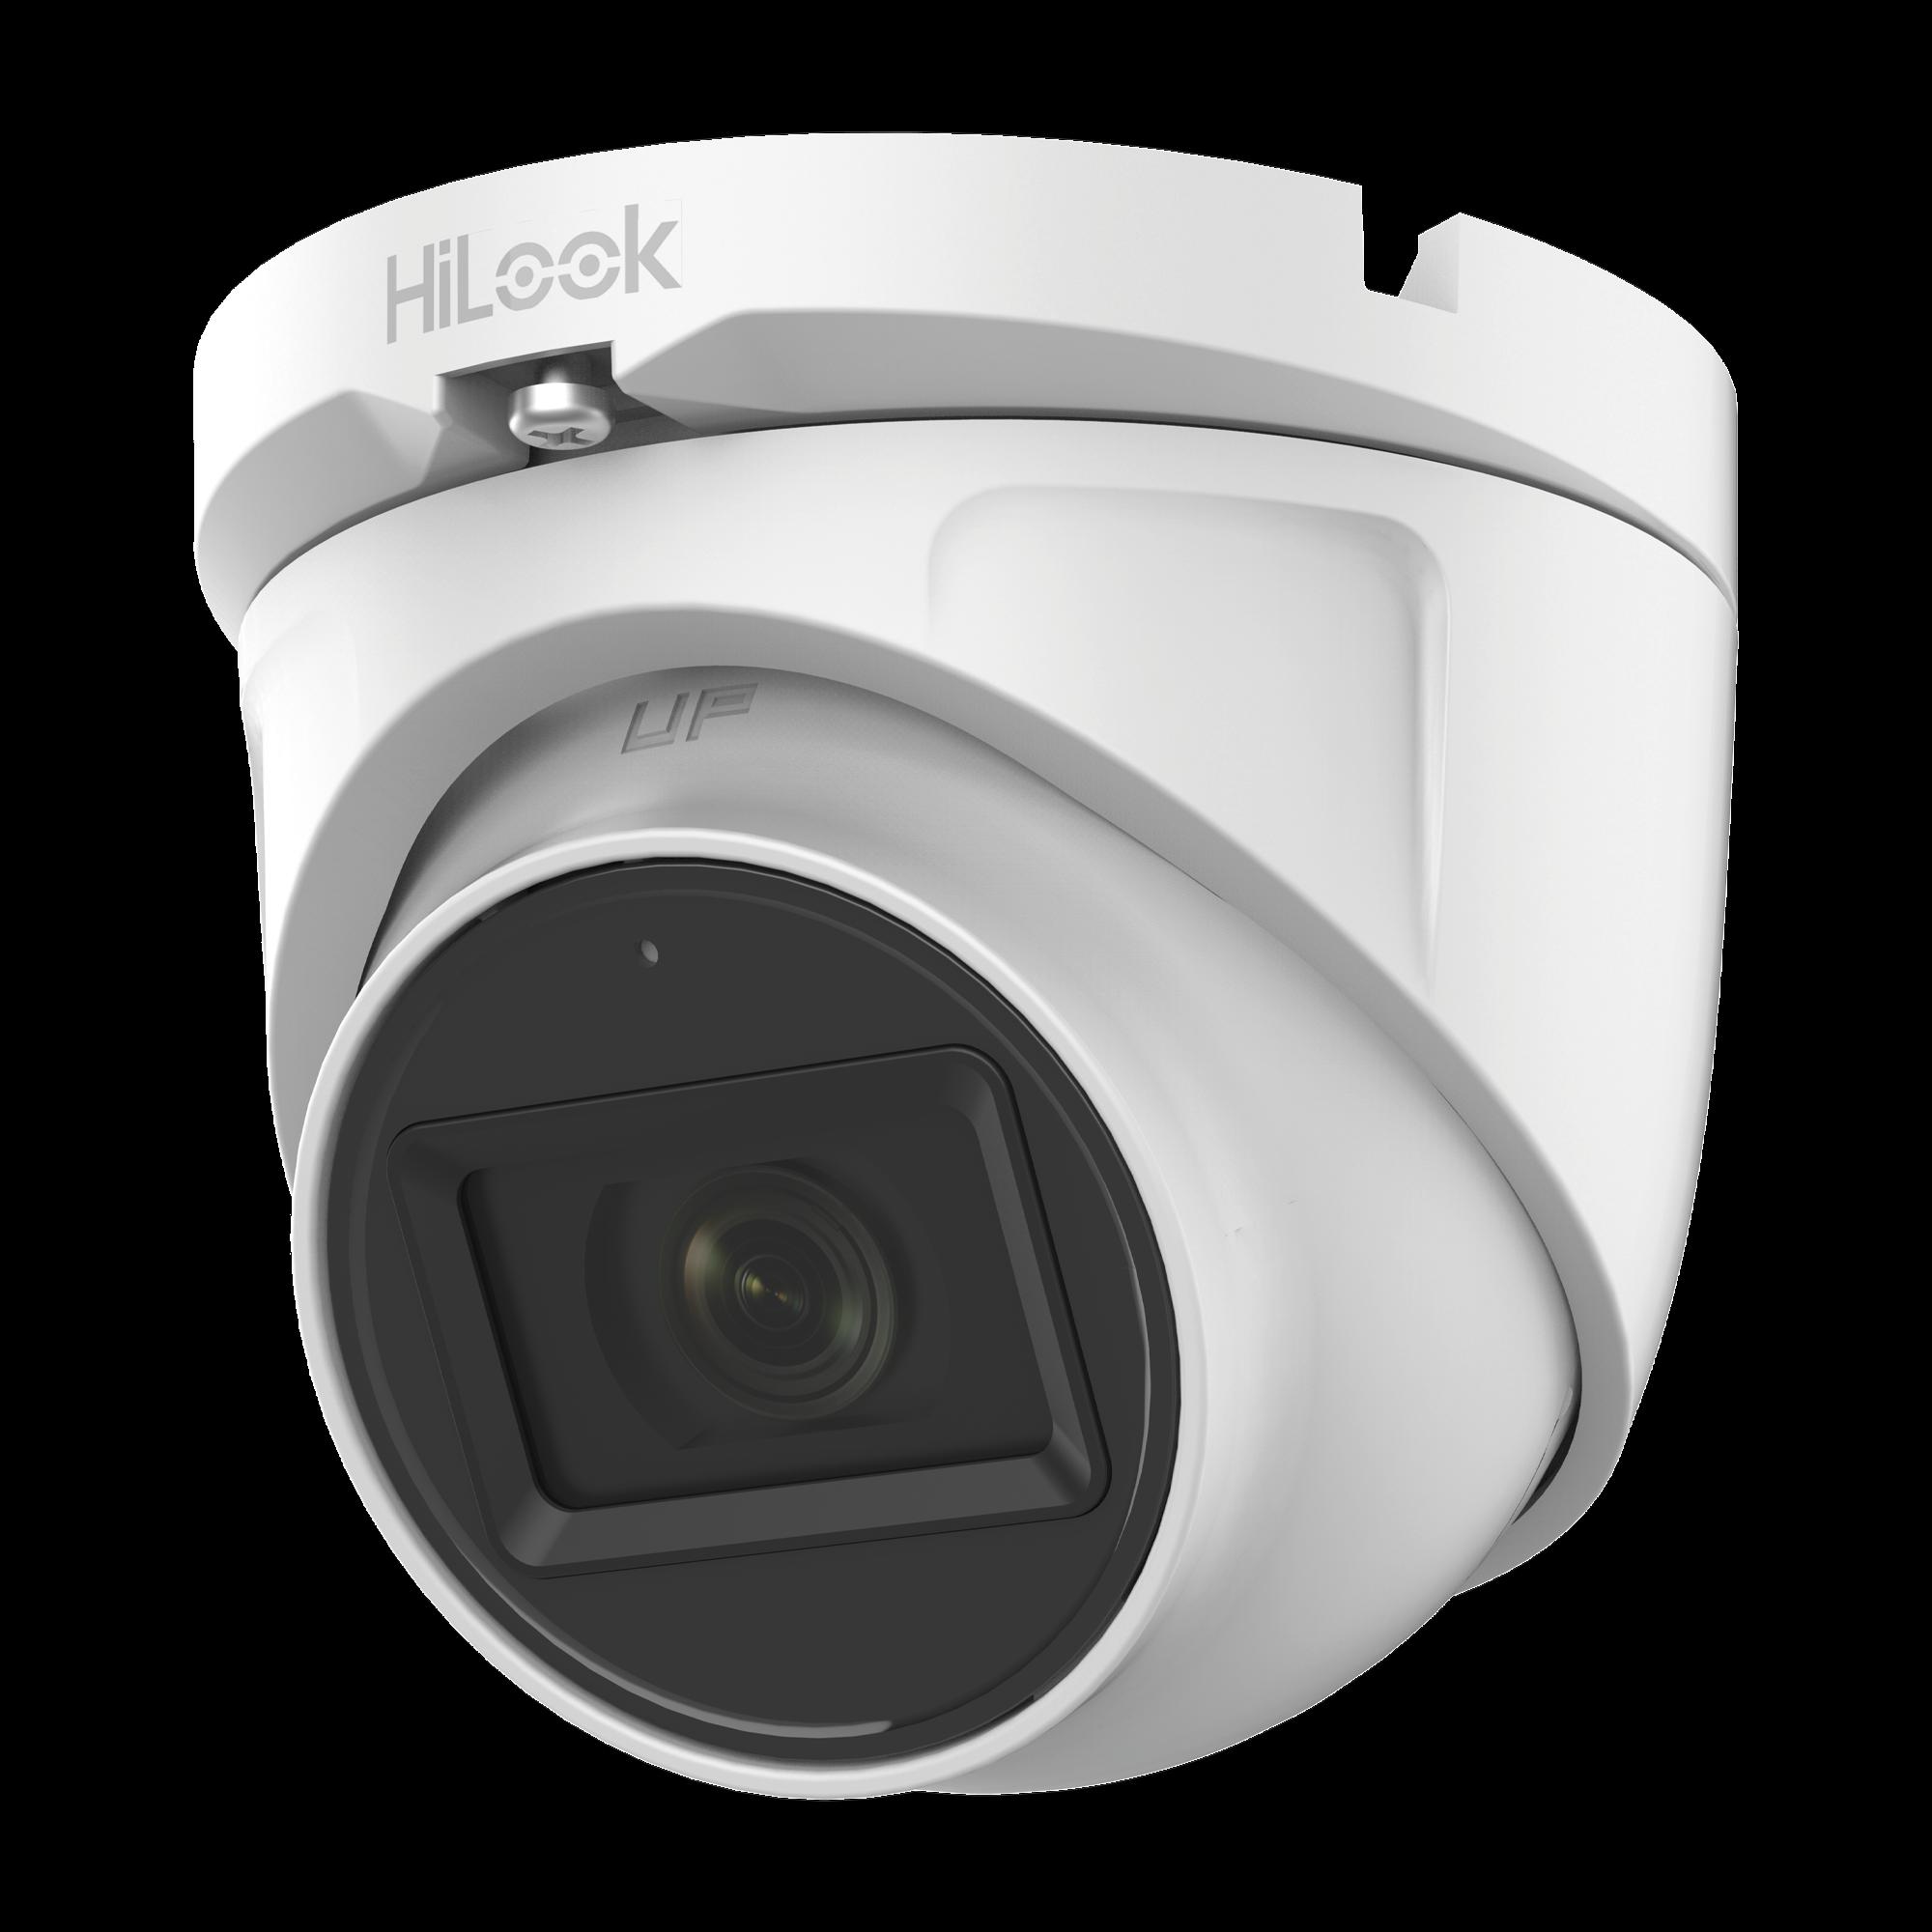 Turret TURBOHD 2 Megapixel (1080p) / Gran Angular 106? / Lente 2.8 mm / Audio por Coaxitron / 30 mts IR EXIR / Exterior IP66 / 4 Tecnologias / dWDR